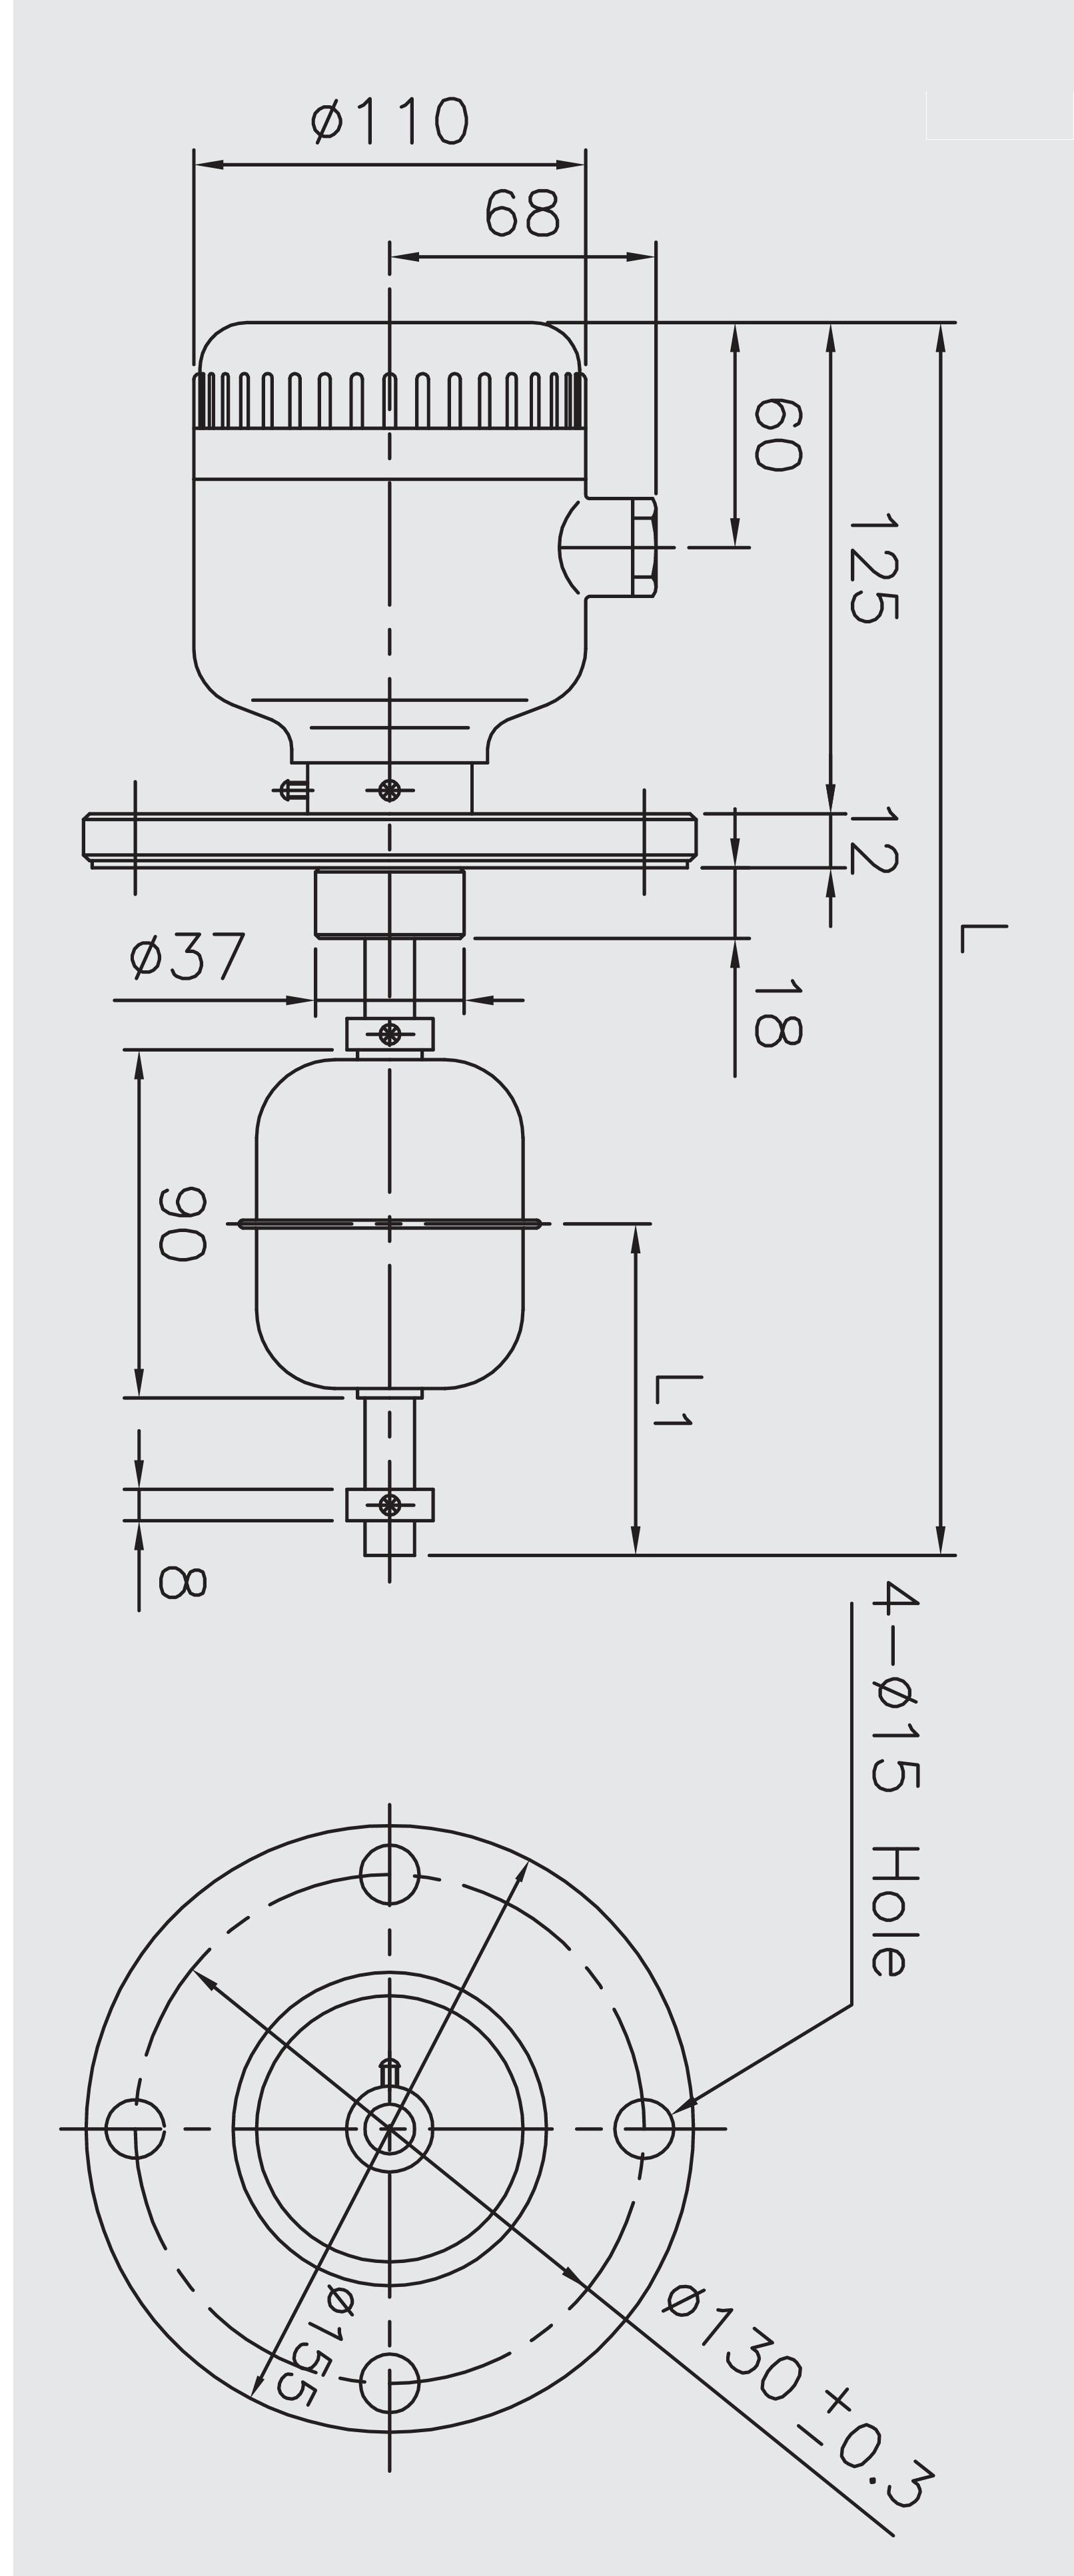 Parker Pump Wiring Diagram Electrical Diagrams Pool Auto U2022 Neat Heat Schematic